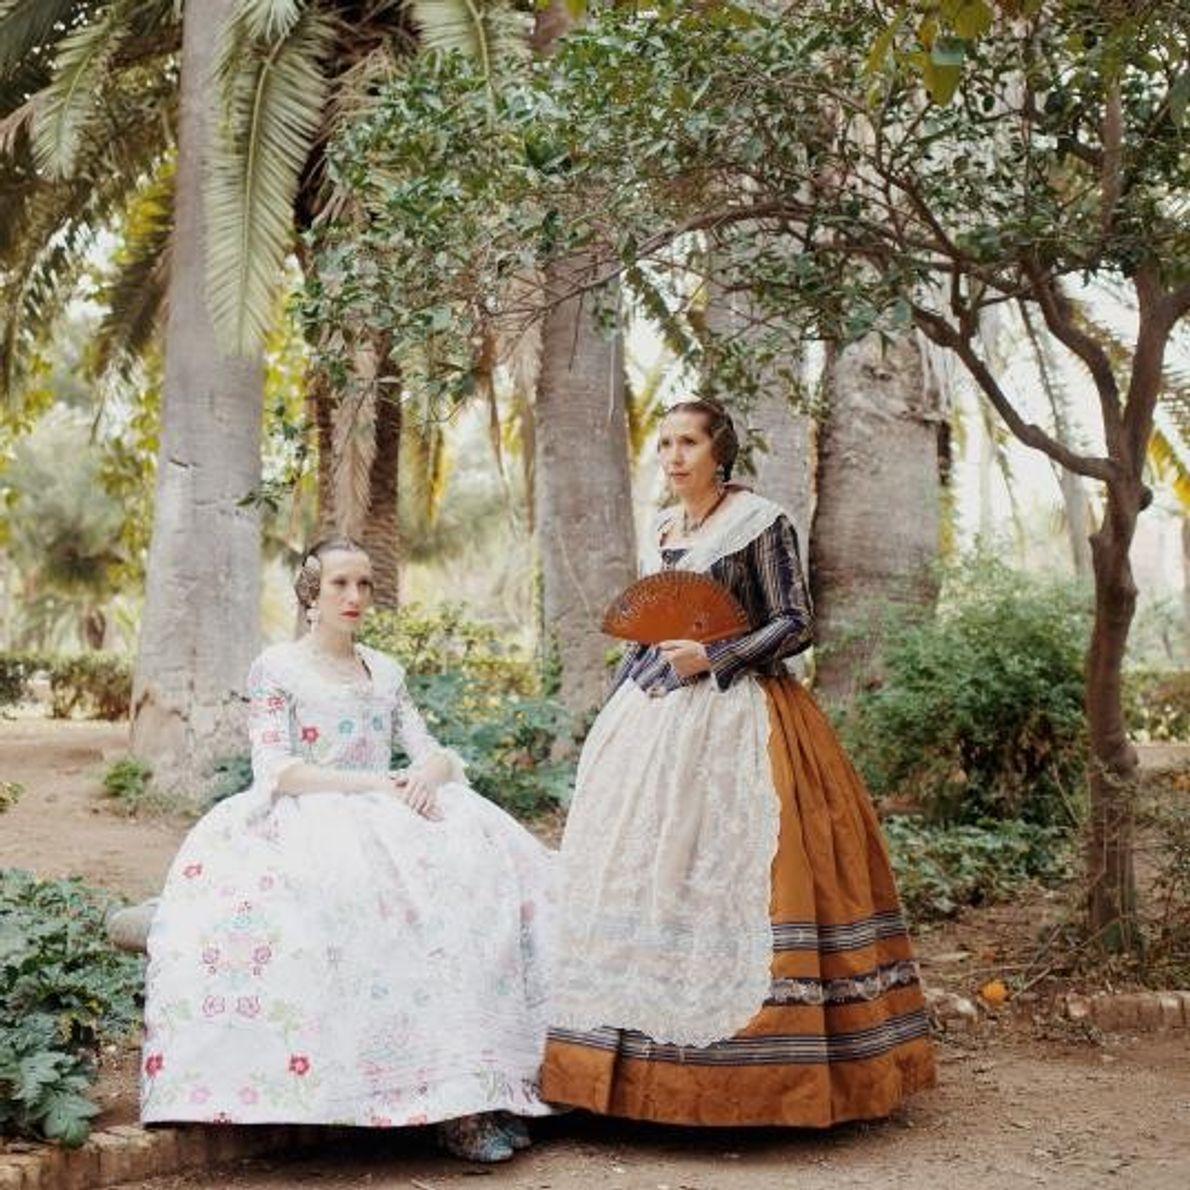 Cristina y su madre, Lola